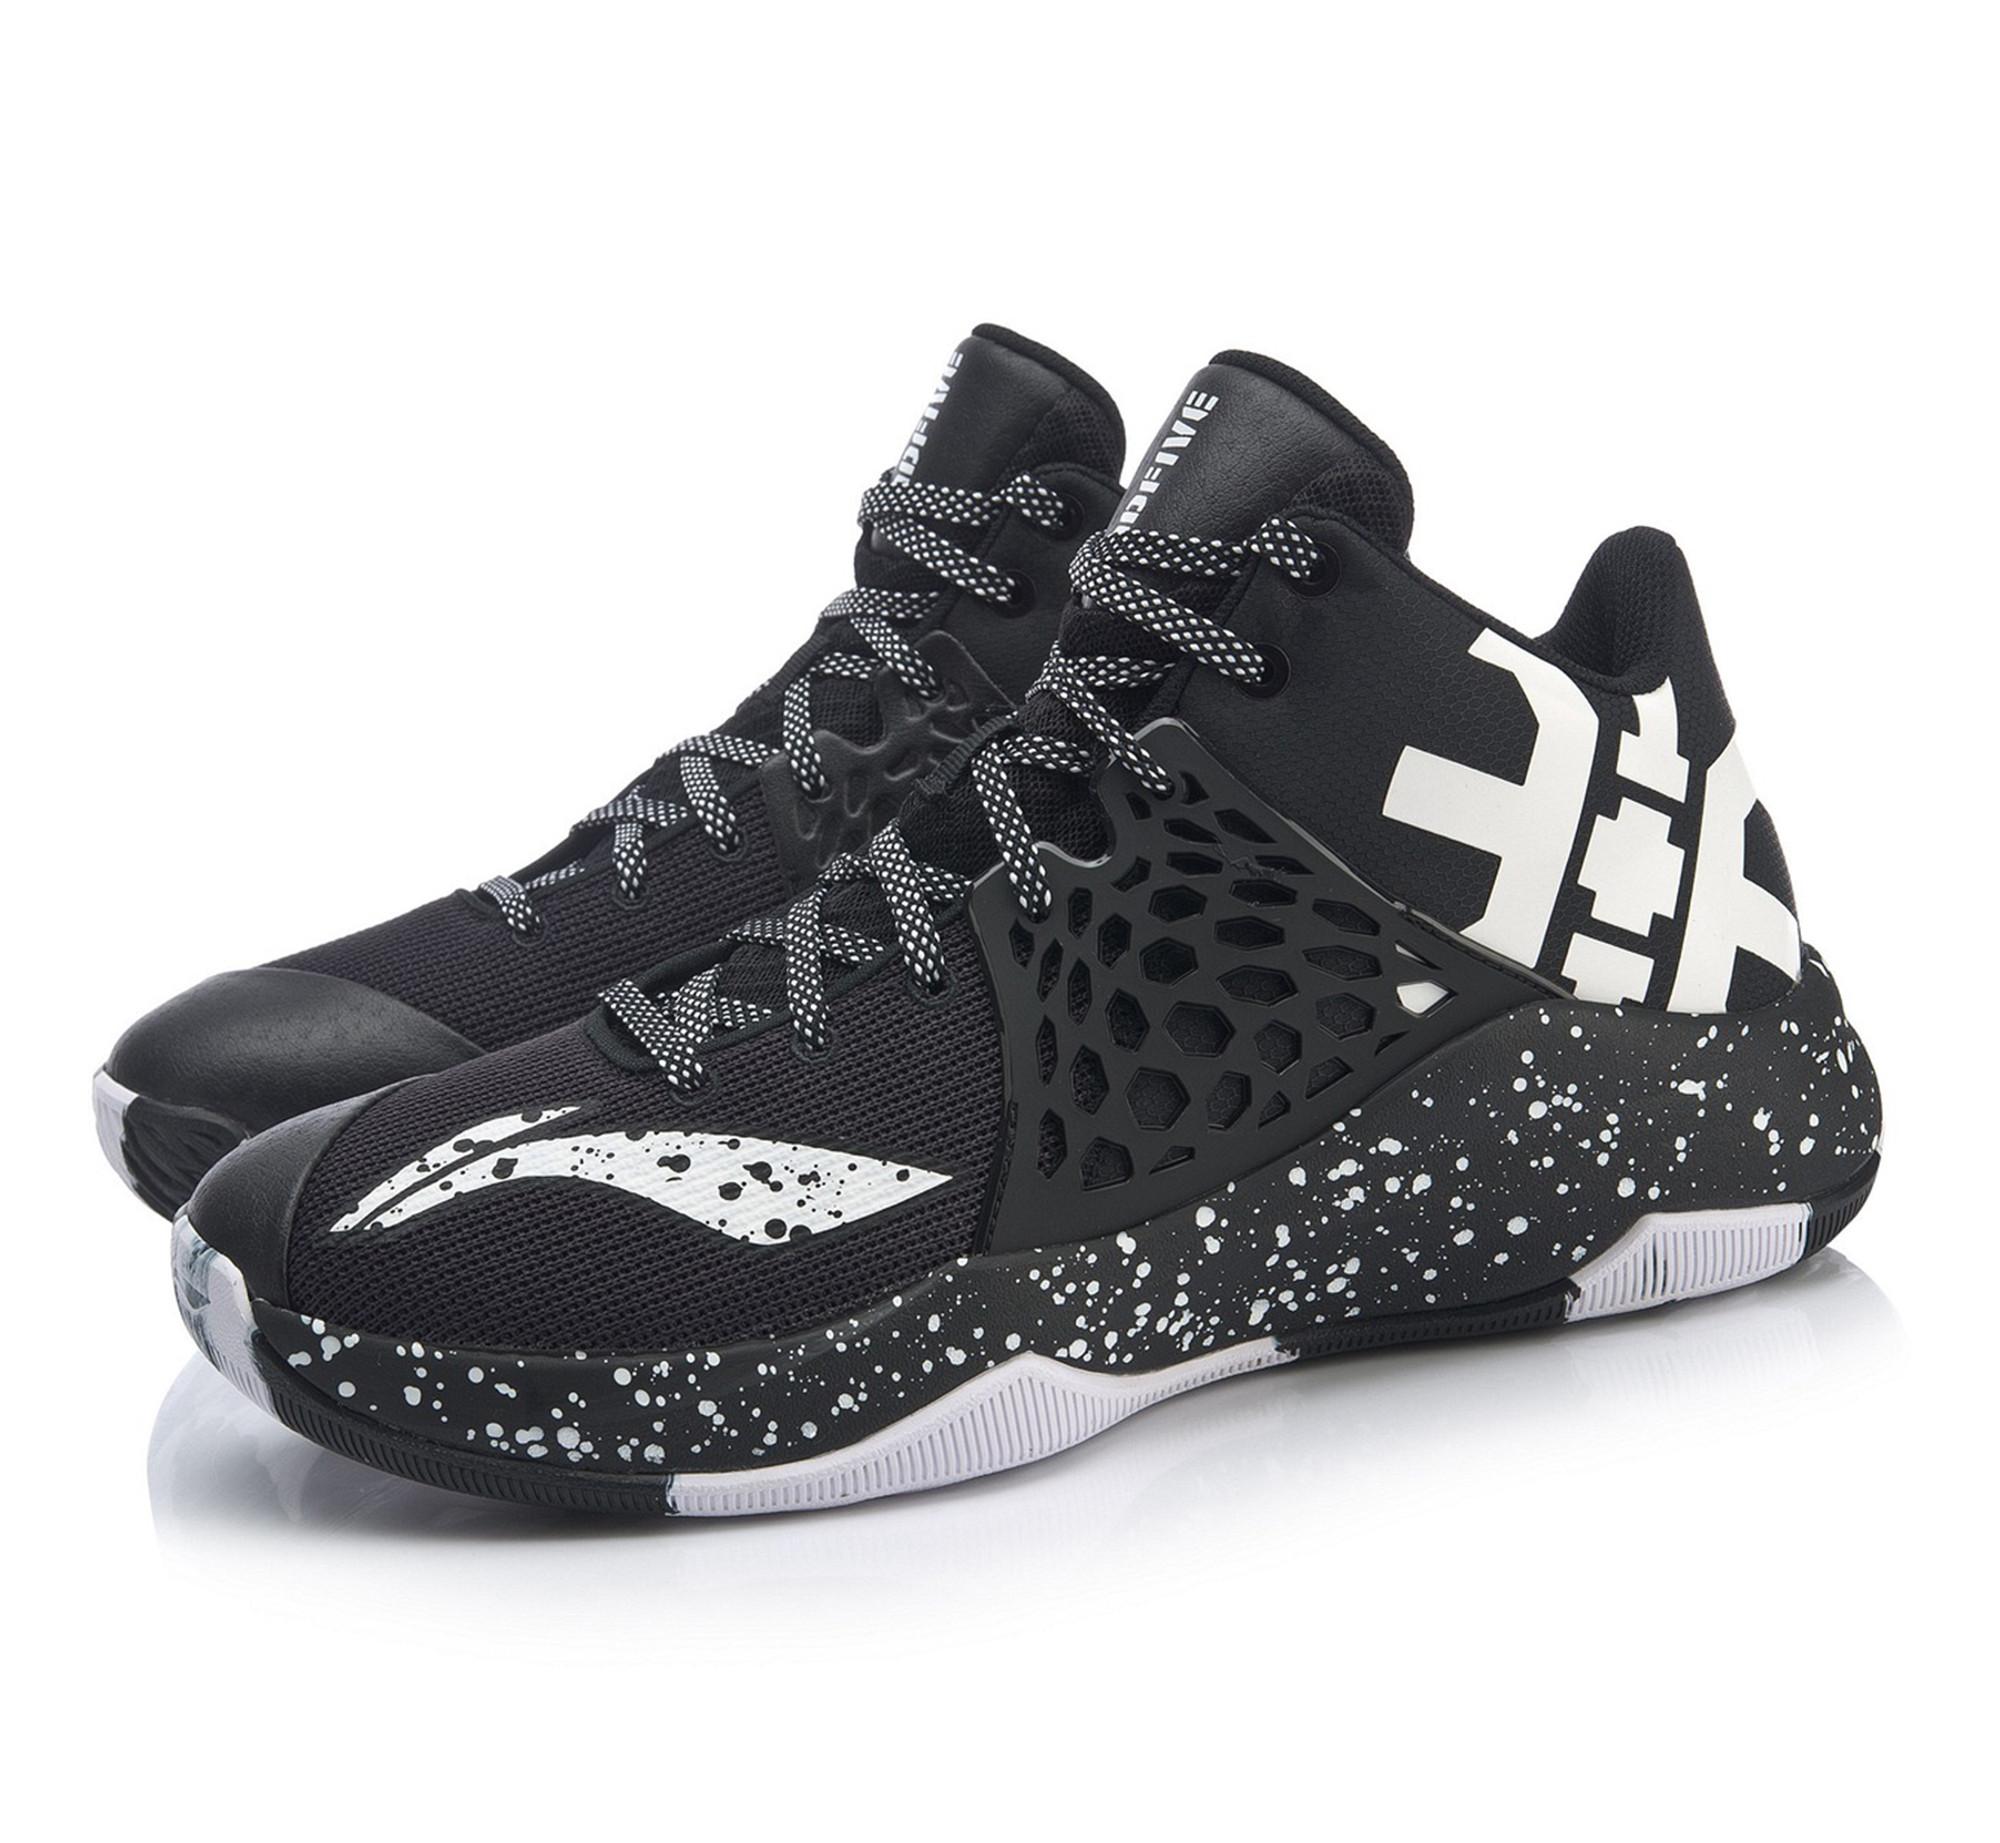 Li-Ning Sonic VII Team Basketball Shoes